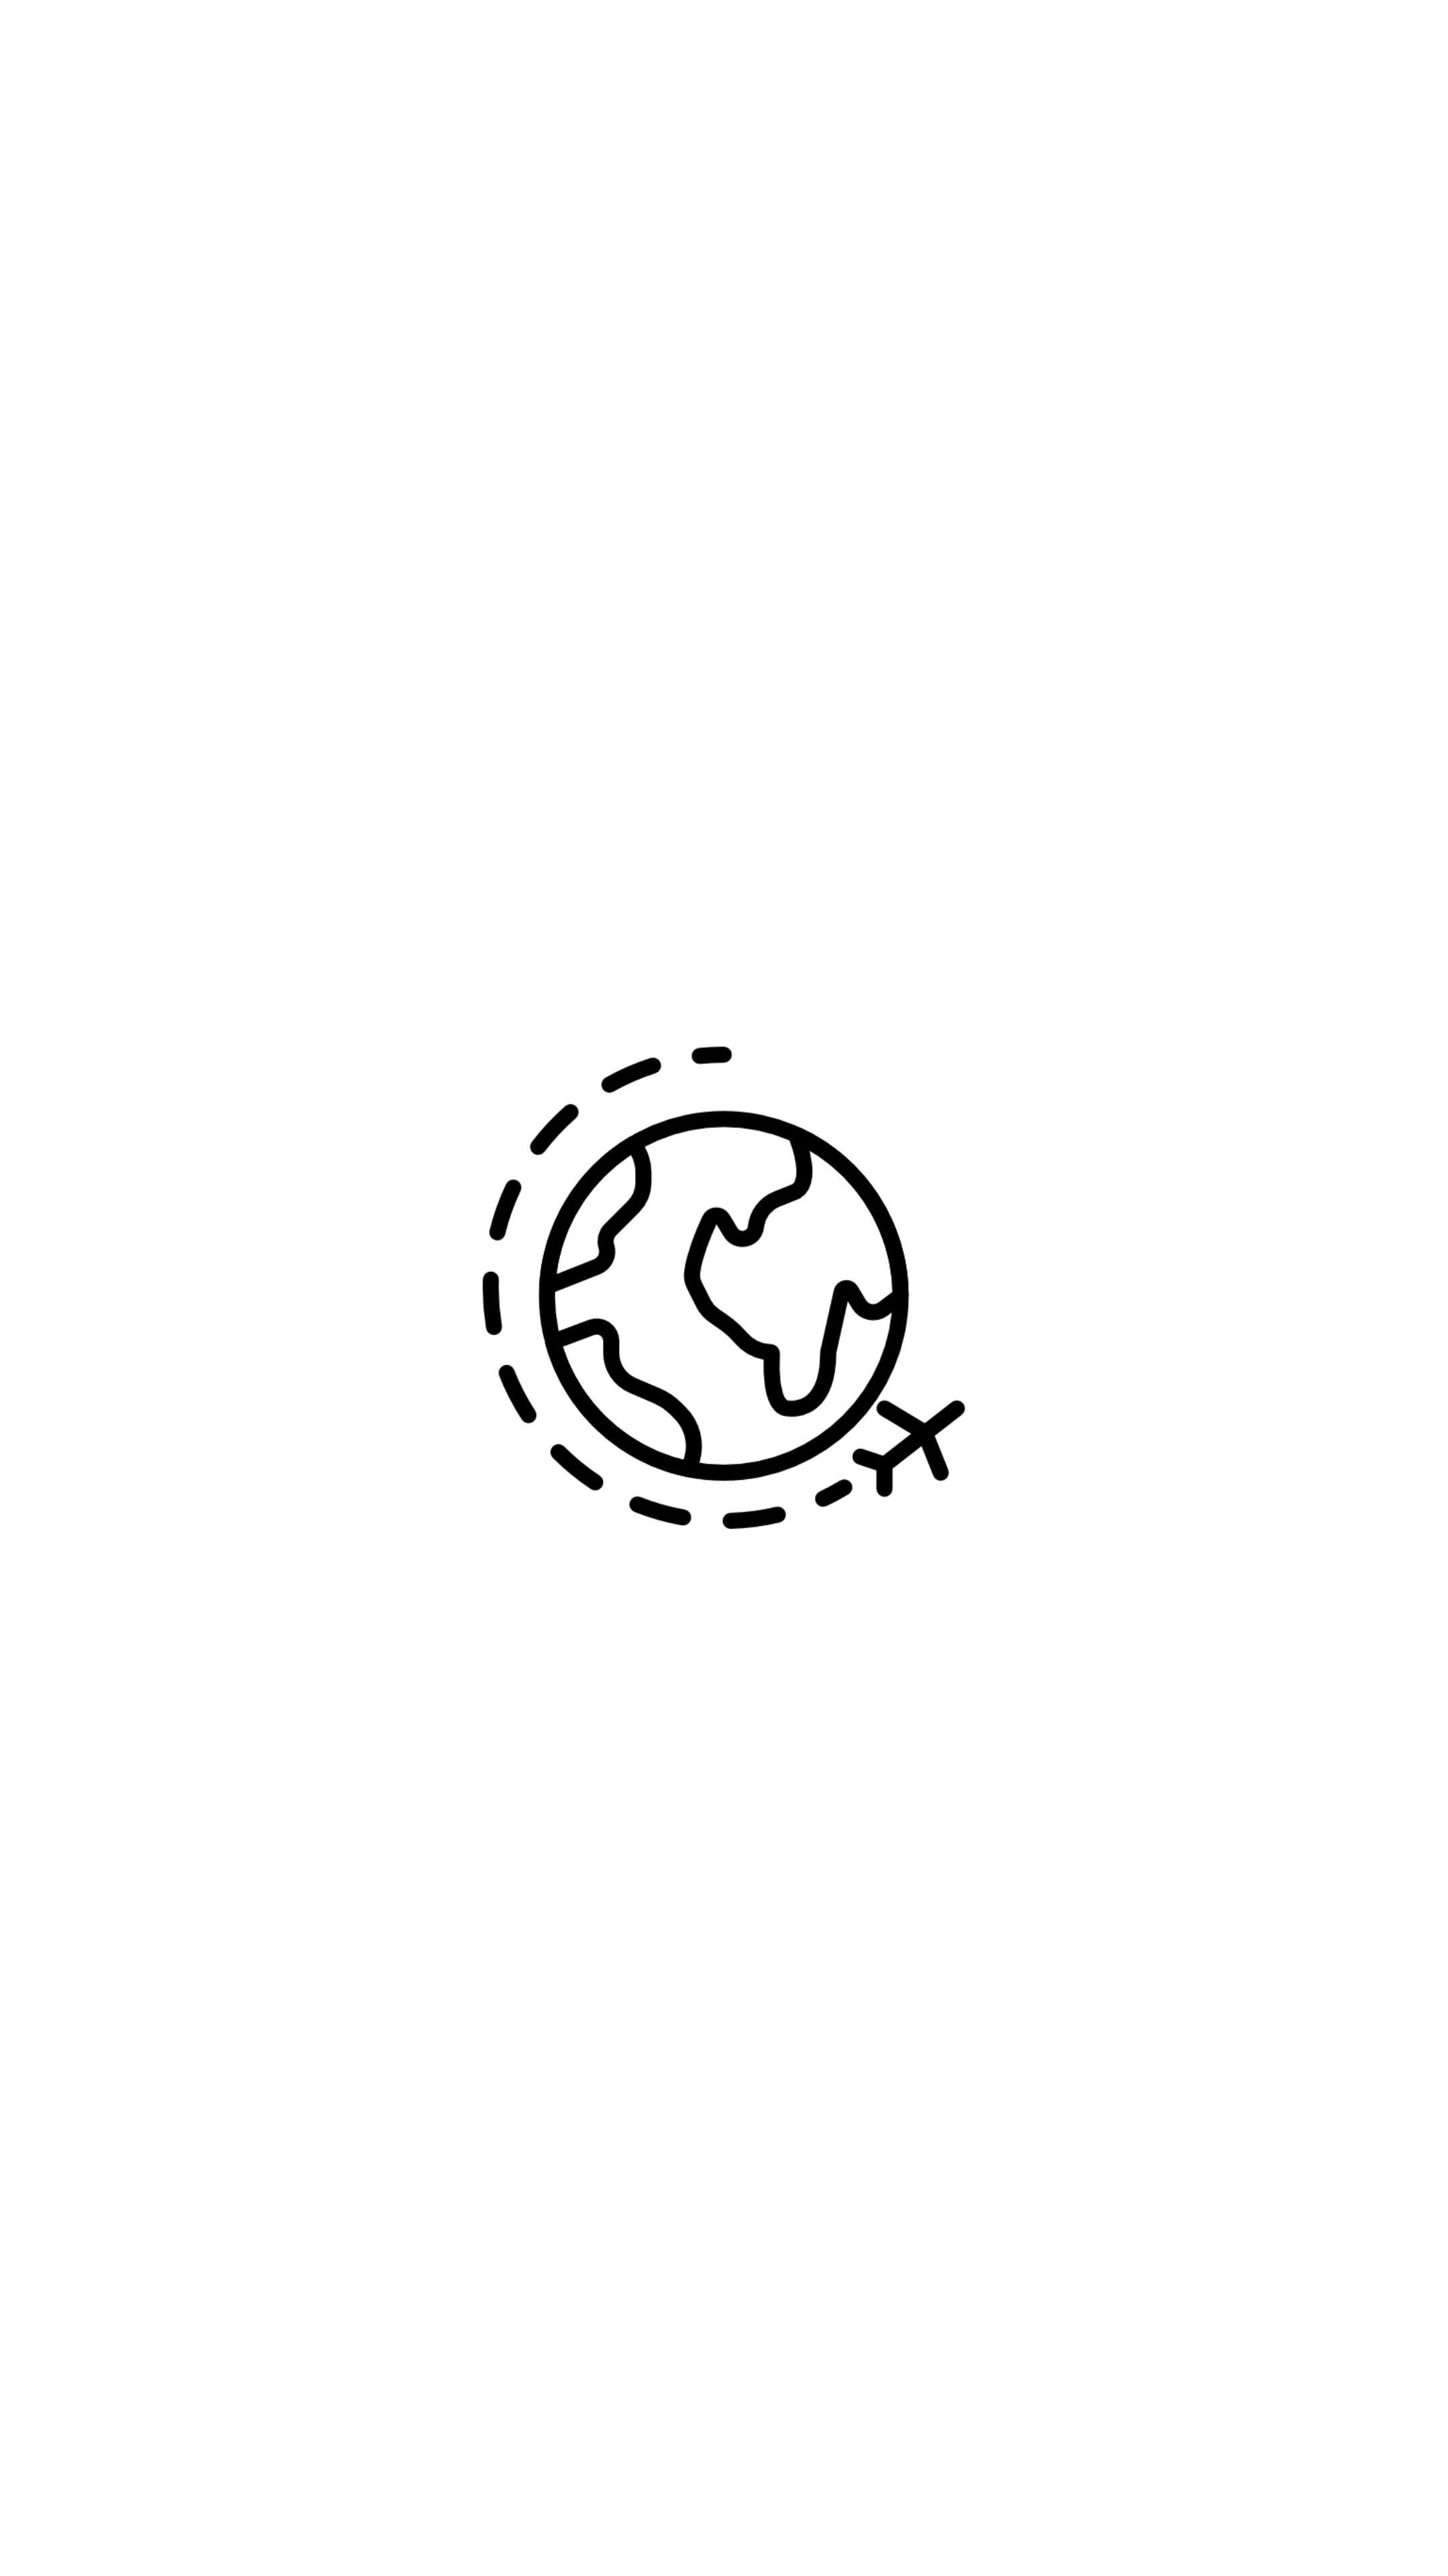 Cute Black And White Instagram Logo Logodix